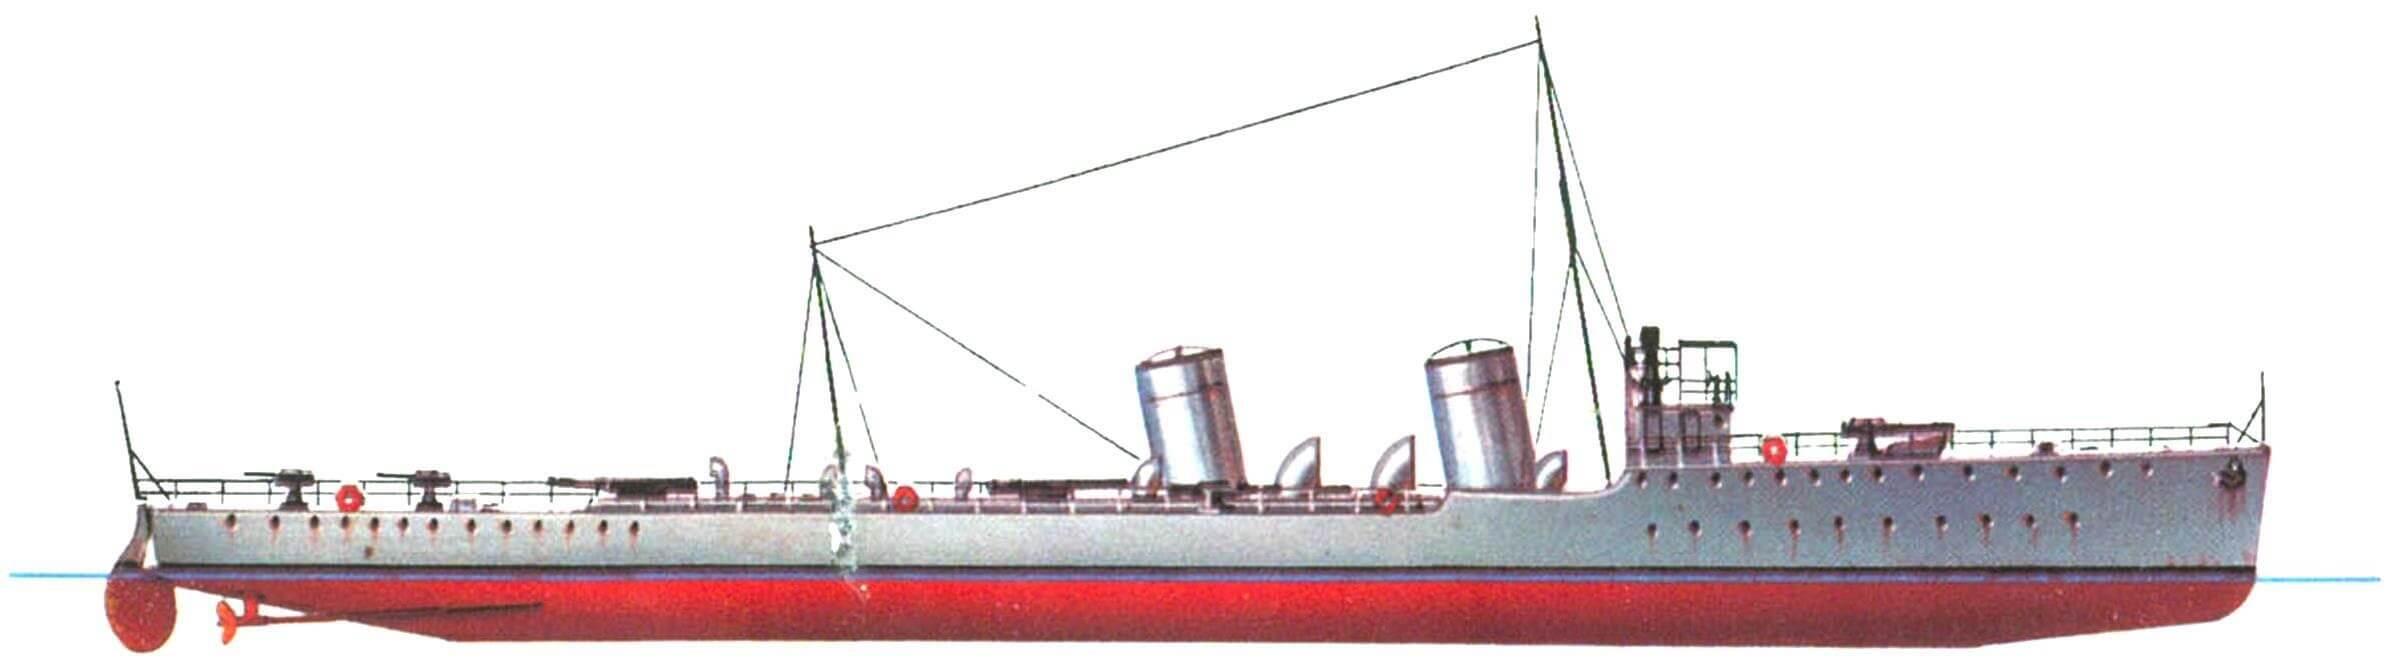 "187. Эсминец ""Аудаче"" (I), Италия, 1914 г."